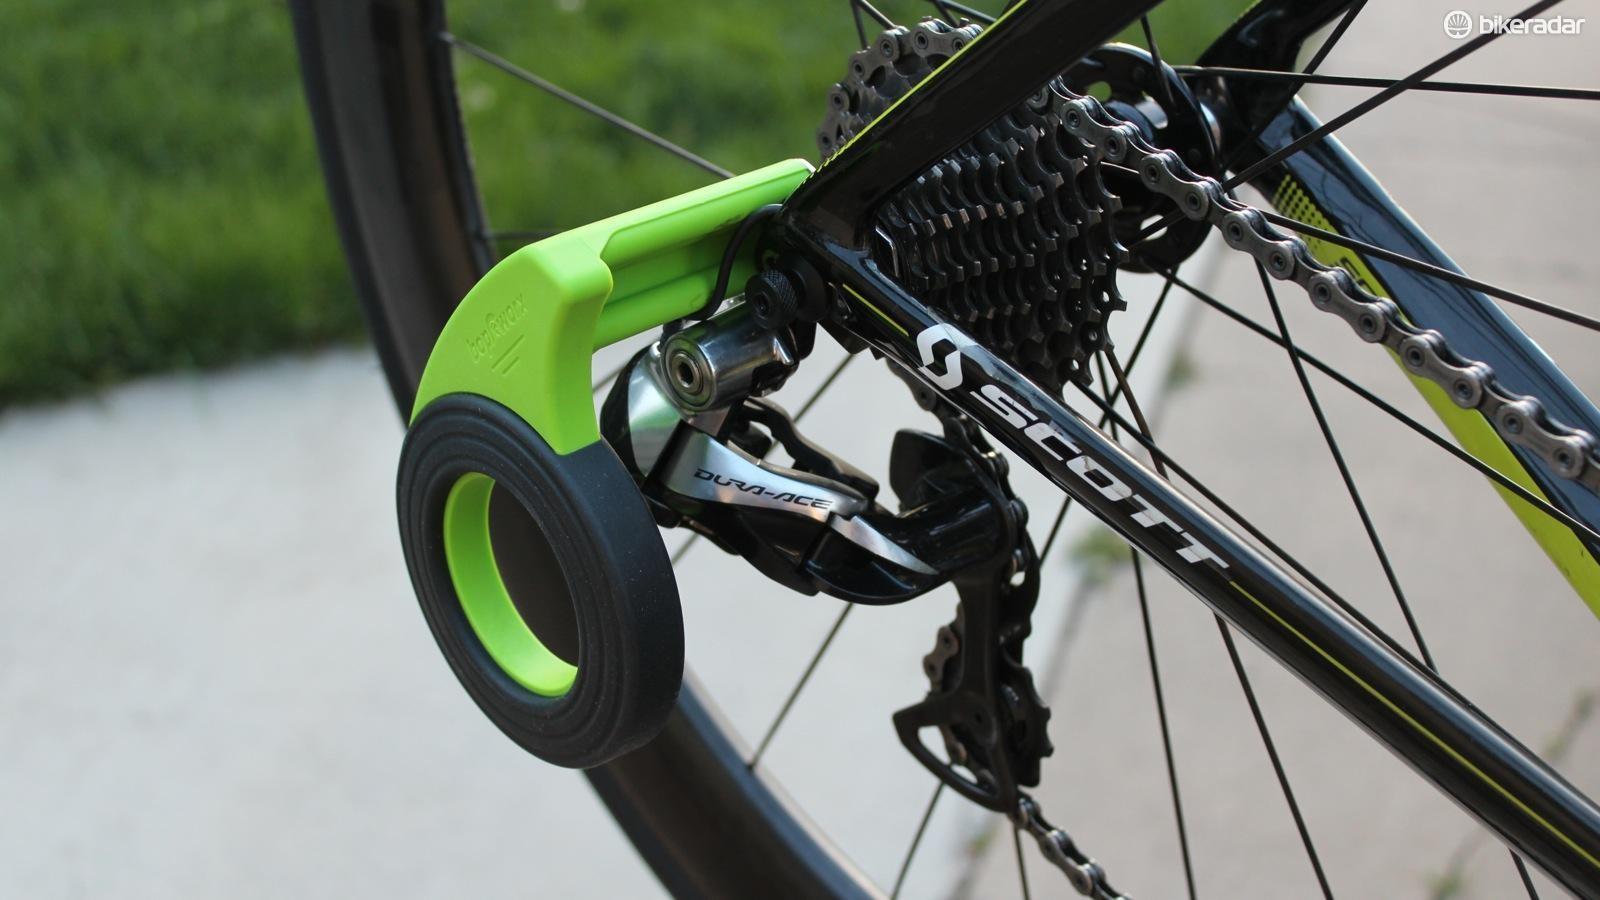 The Bopworx Rear Derailleur Guard/Mech Bike Packing Solution